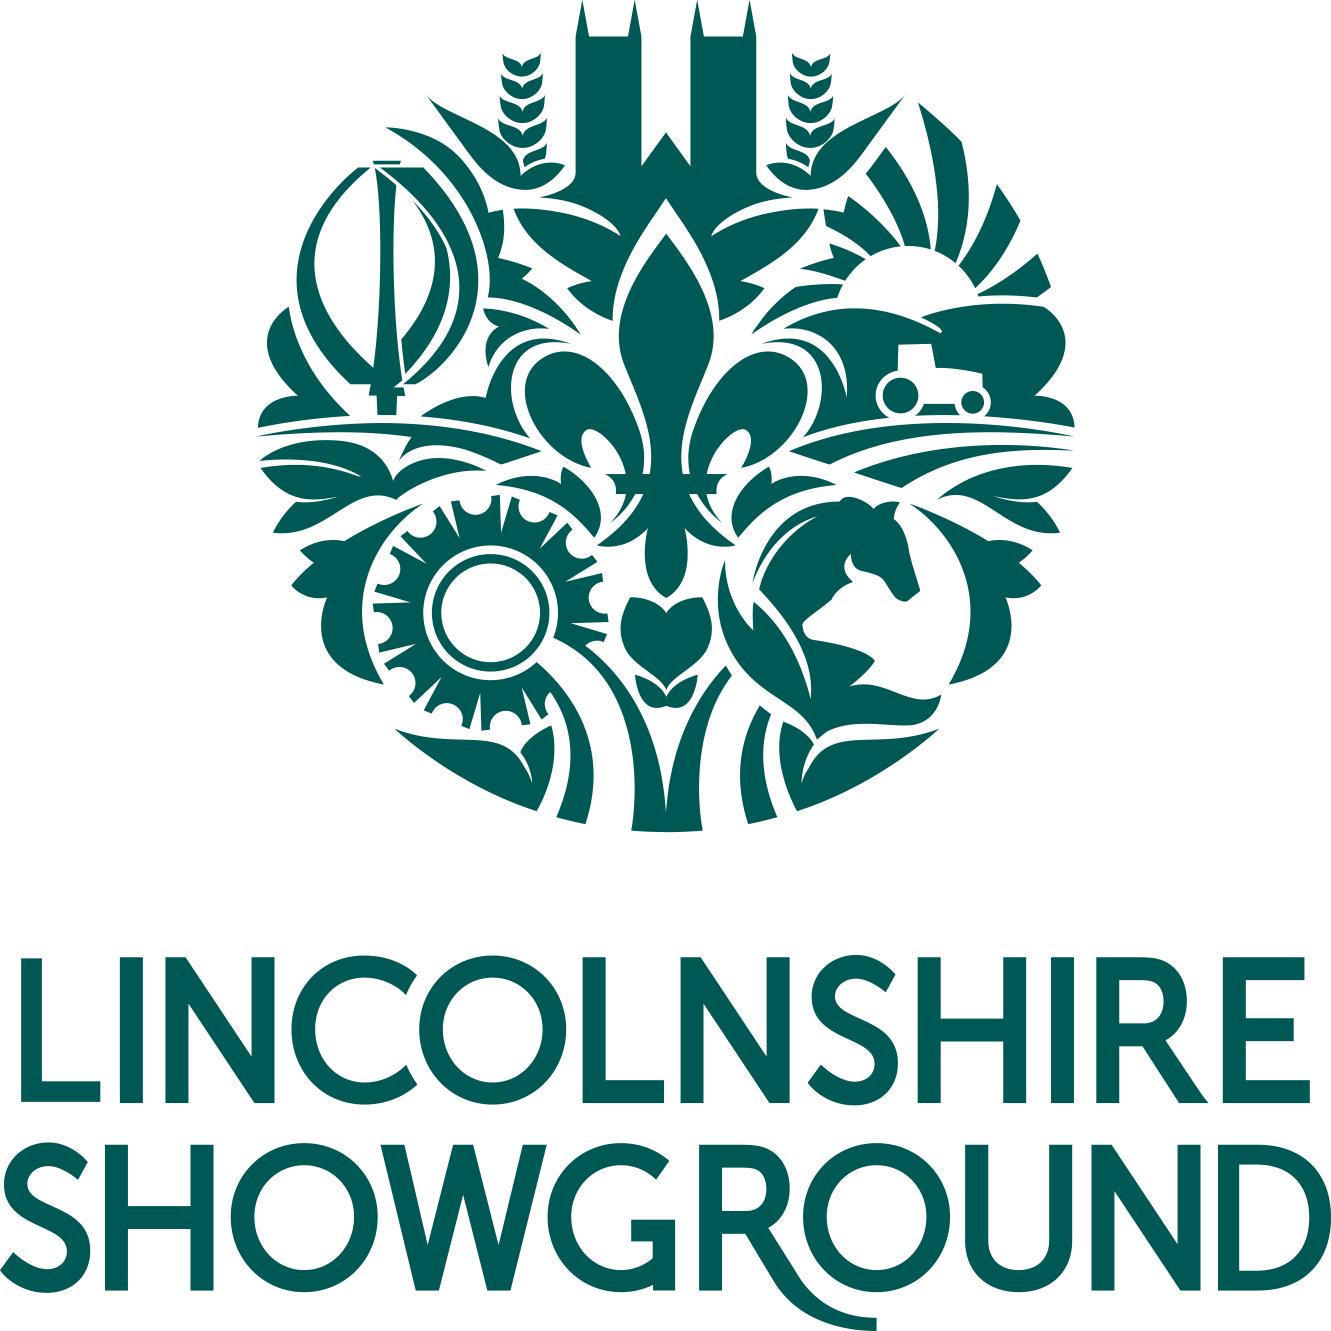 Lincolnshire Showground- Event Venue